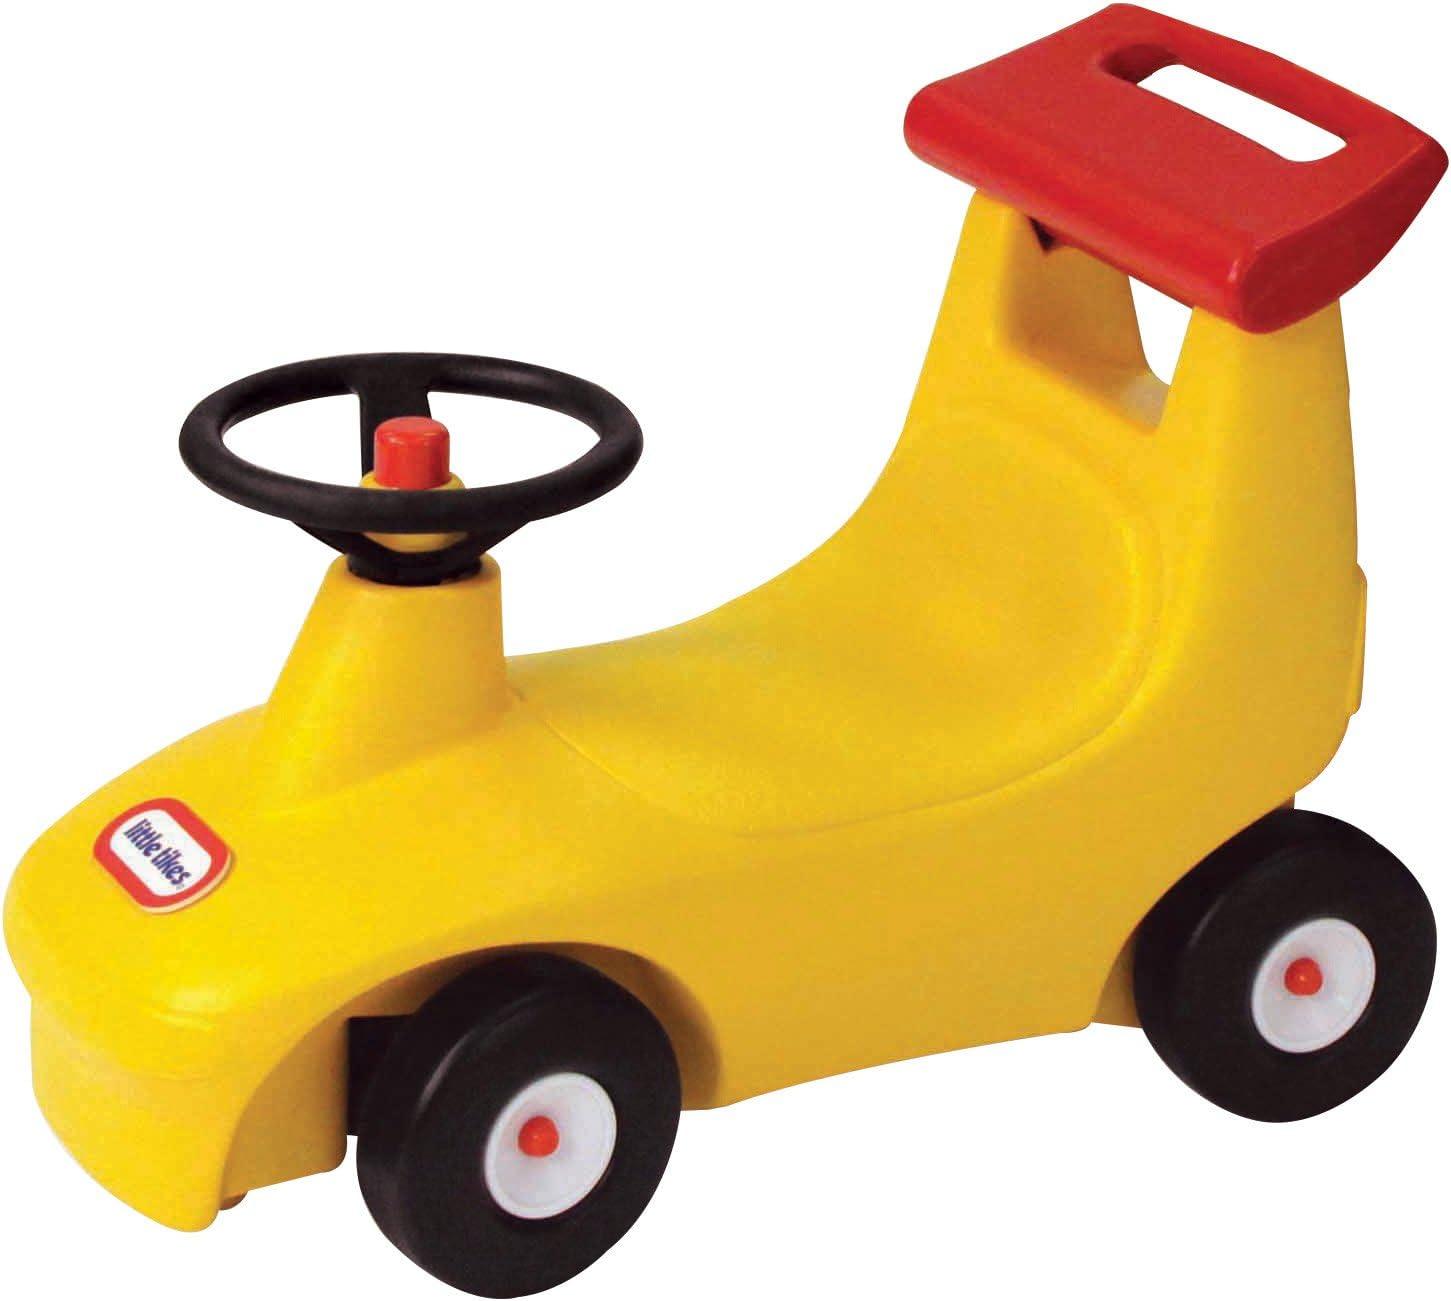 Amazon.com: Little Tikes Push & Ride Caminadora para ...